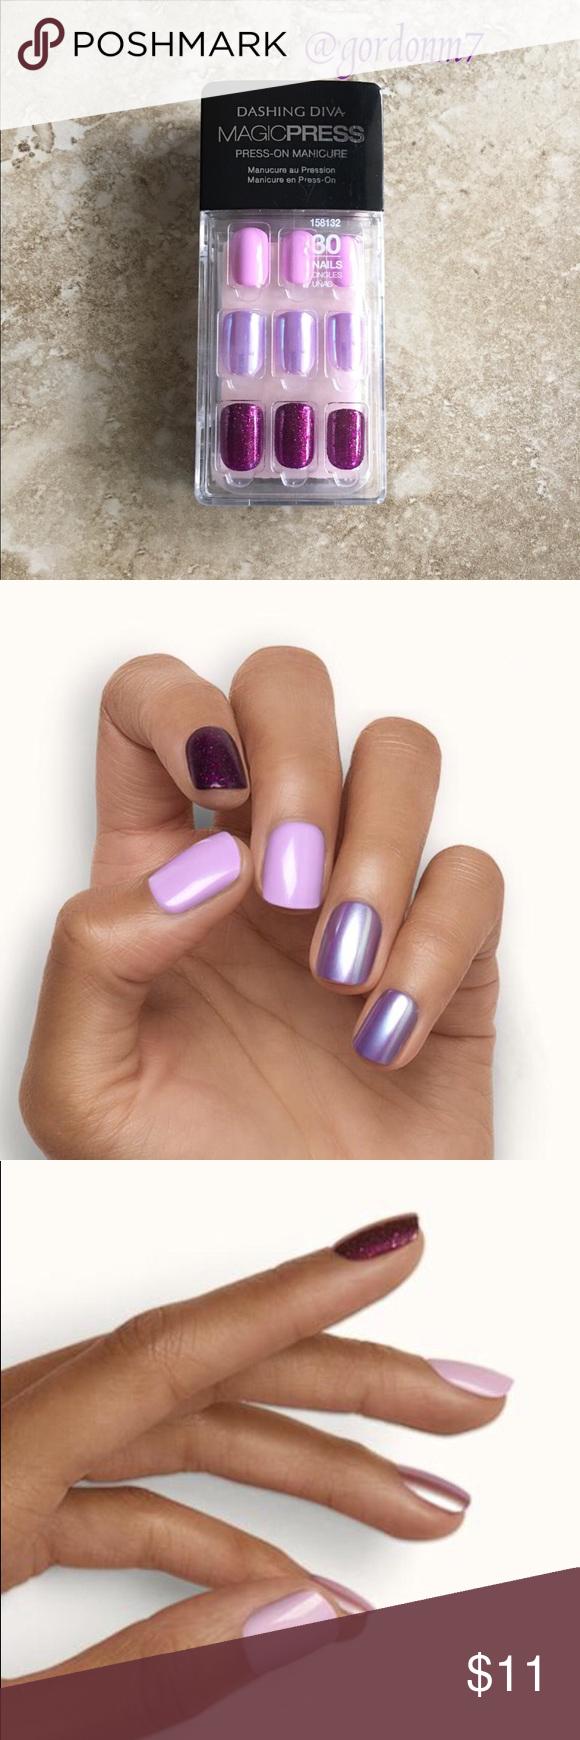 New Dashing Diva Northern Lights Press On Nails Diva Nails Press On Nails Lines On Nails